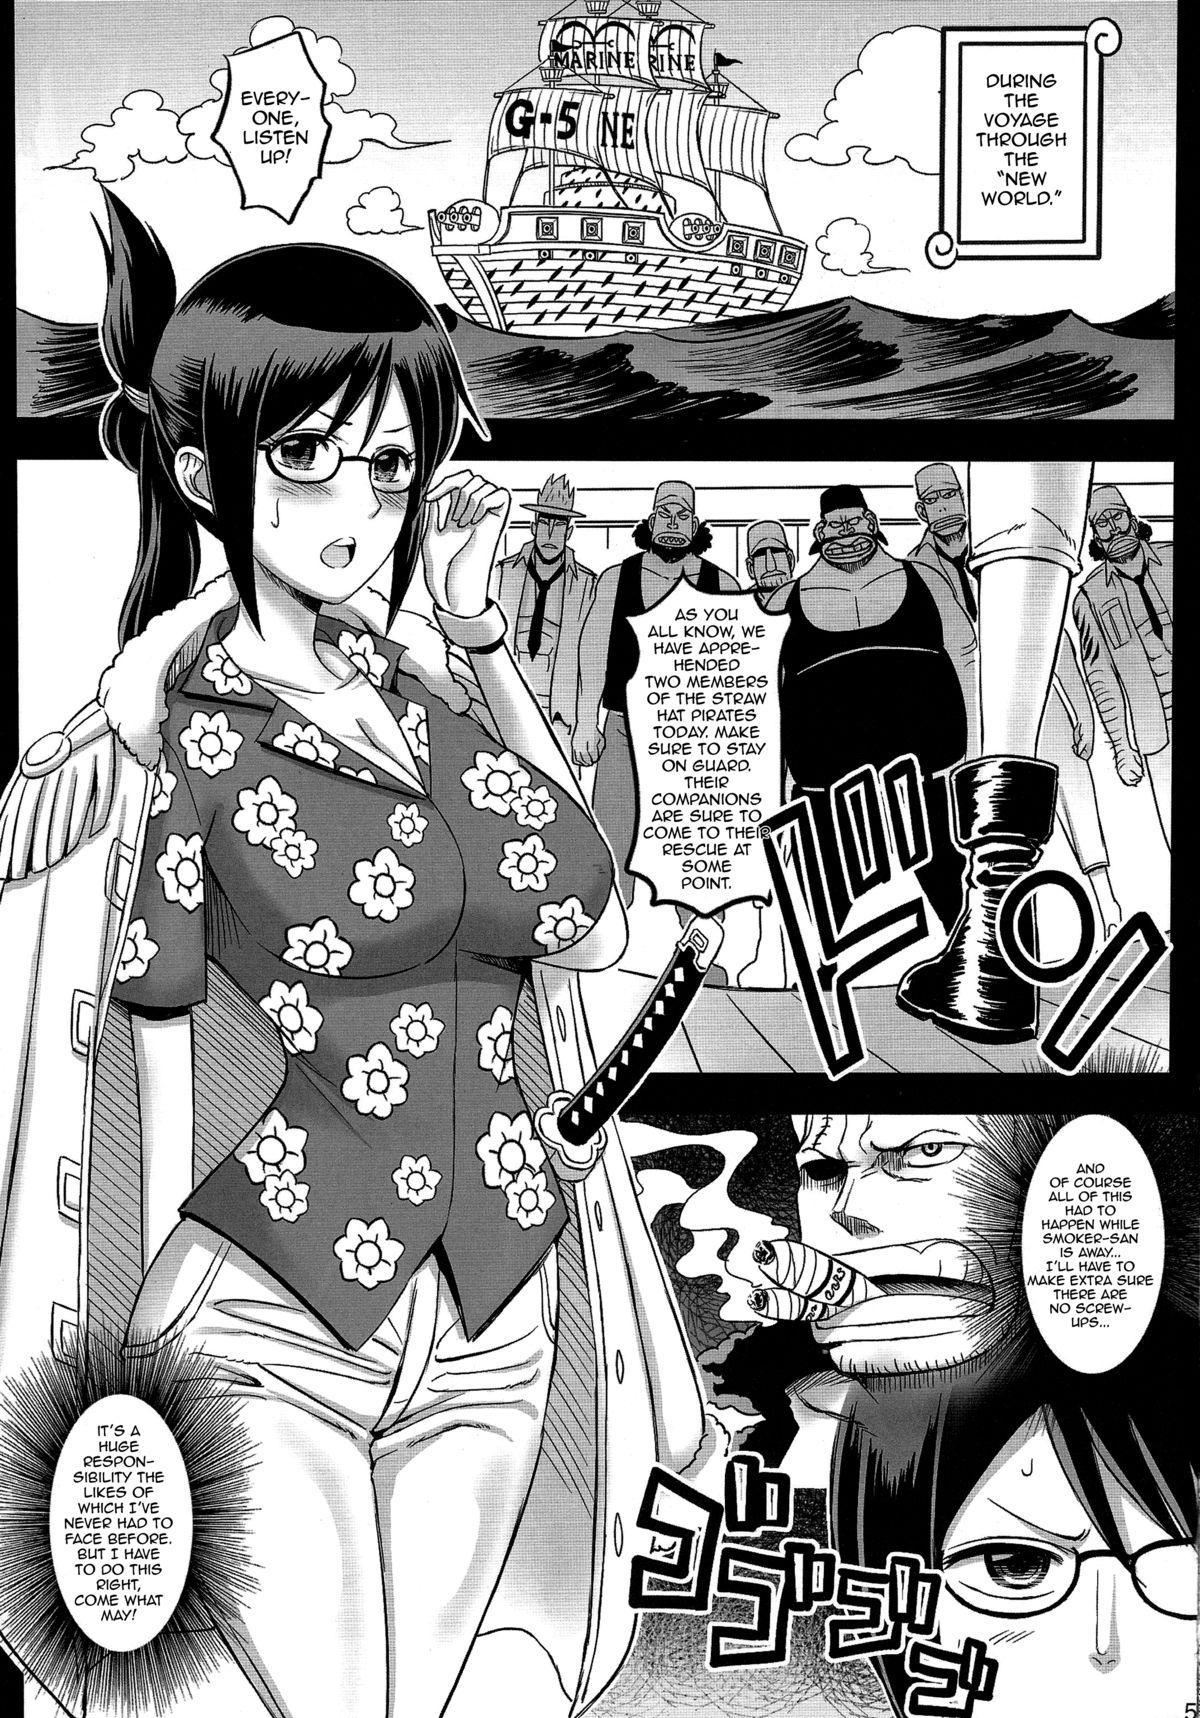 Rakuen Onna Kaizoku 3 - Woman Pirate in Paradise 3